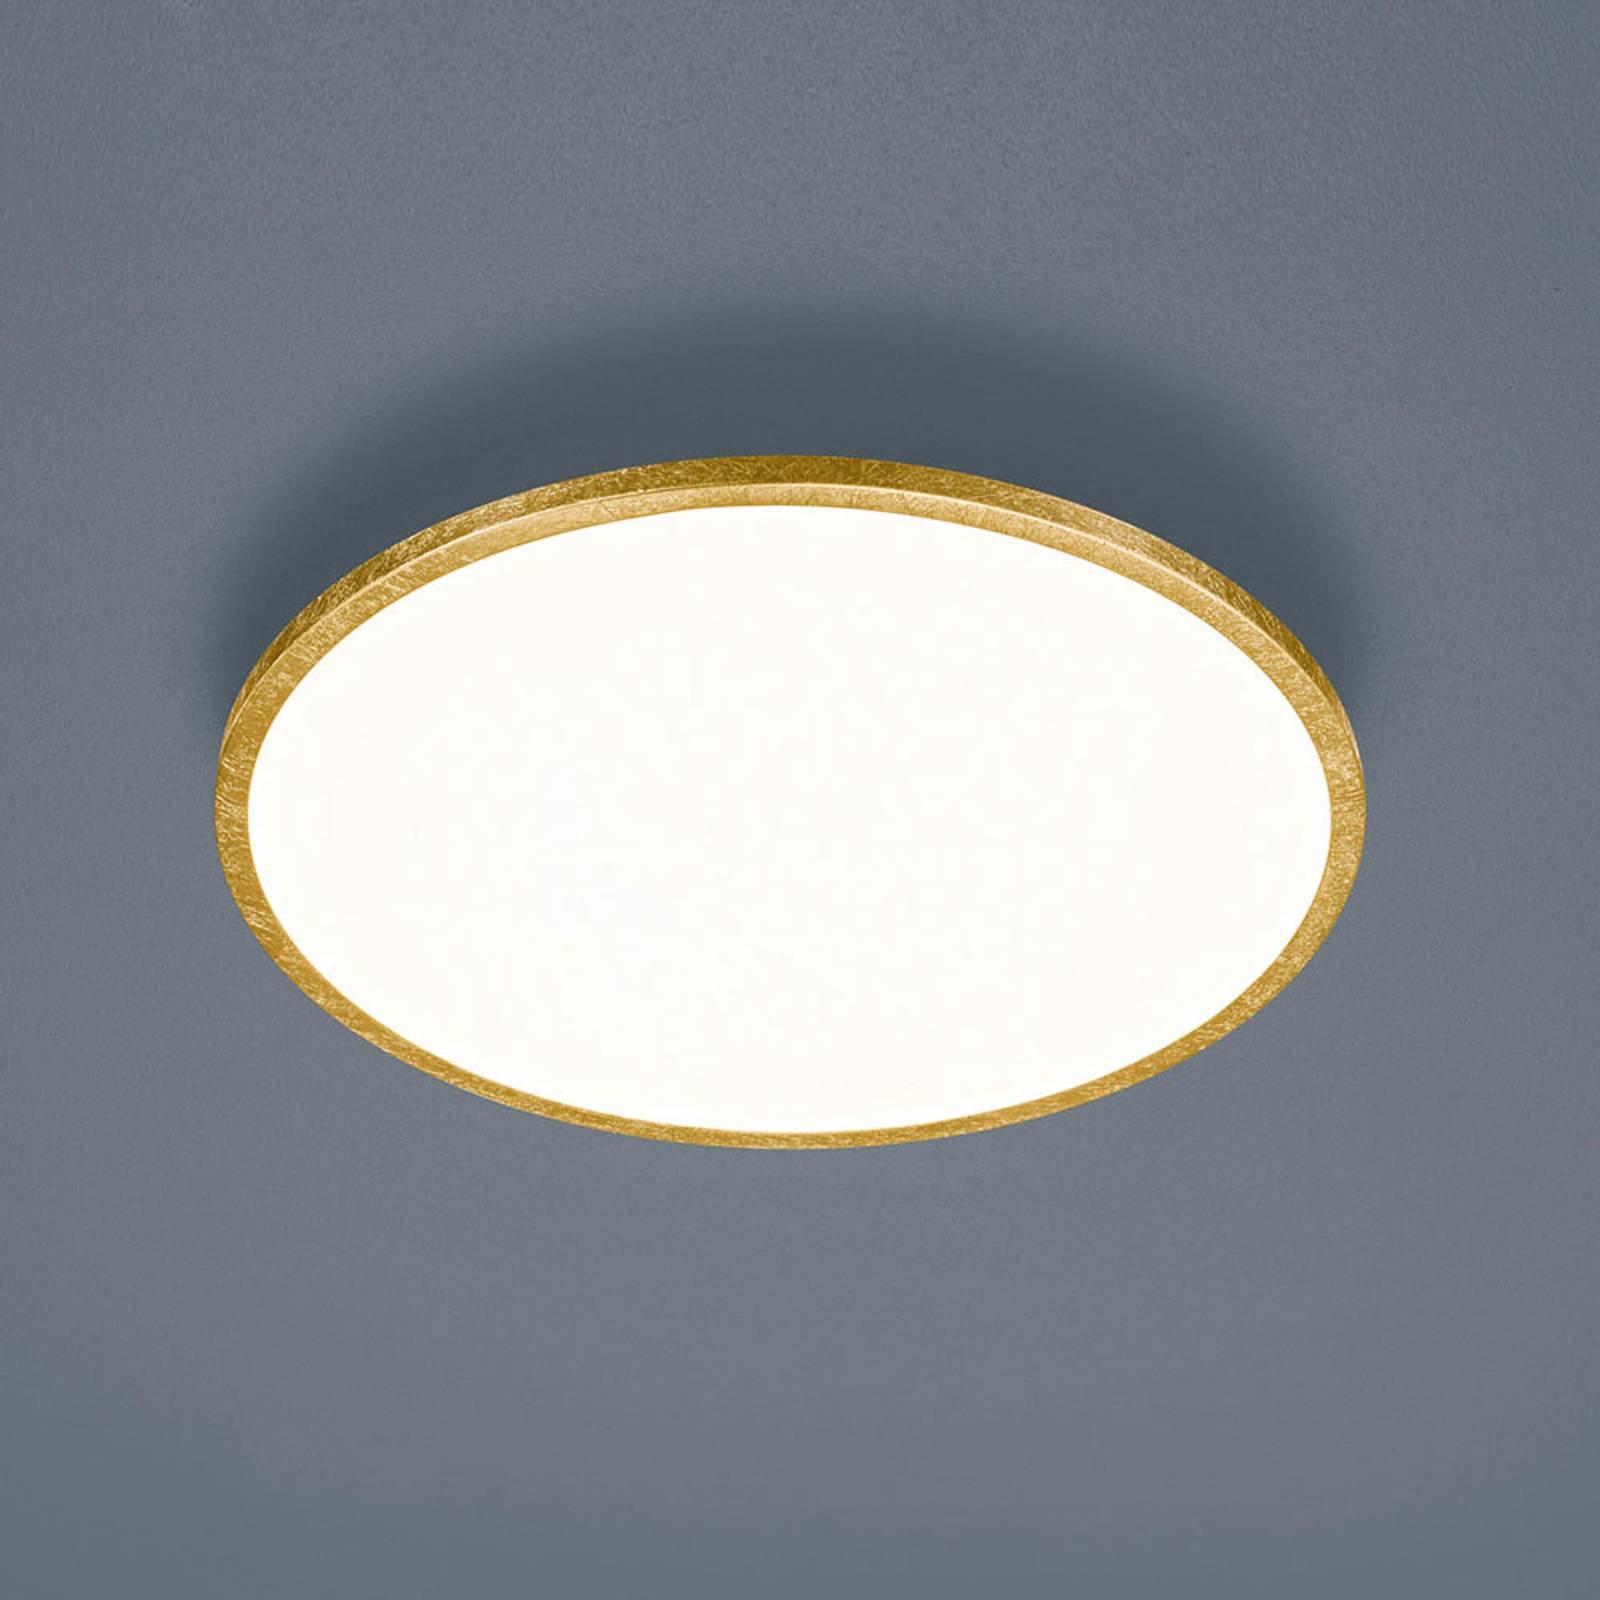 Helestra Rack LED-taklampe, dimbar, rund, gull